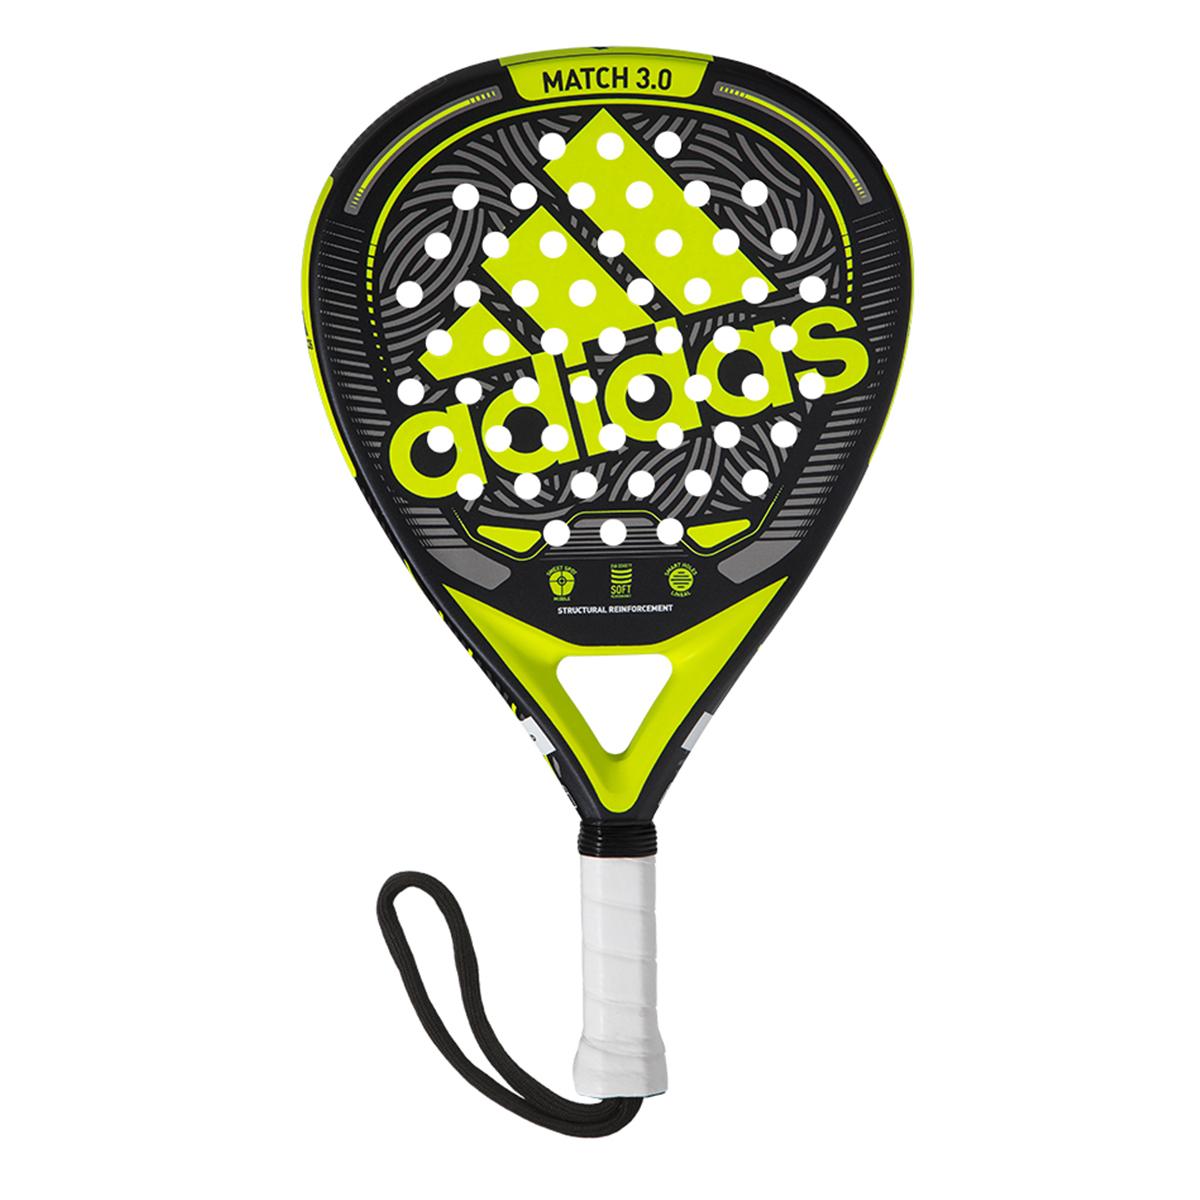 Padel Racket ADIDAS MATCH 3.0